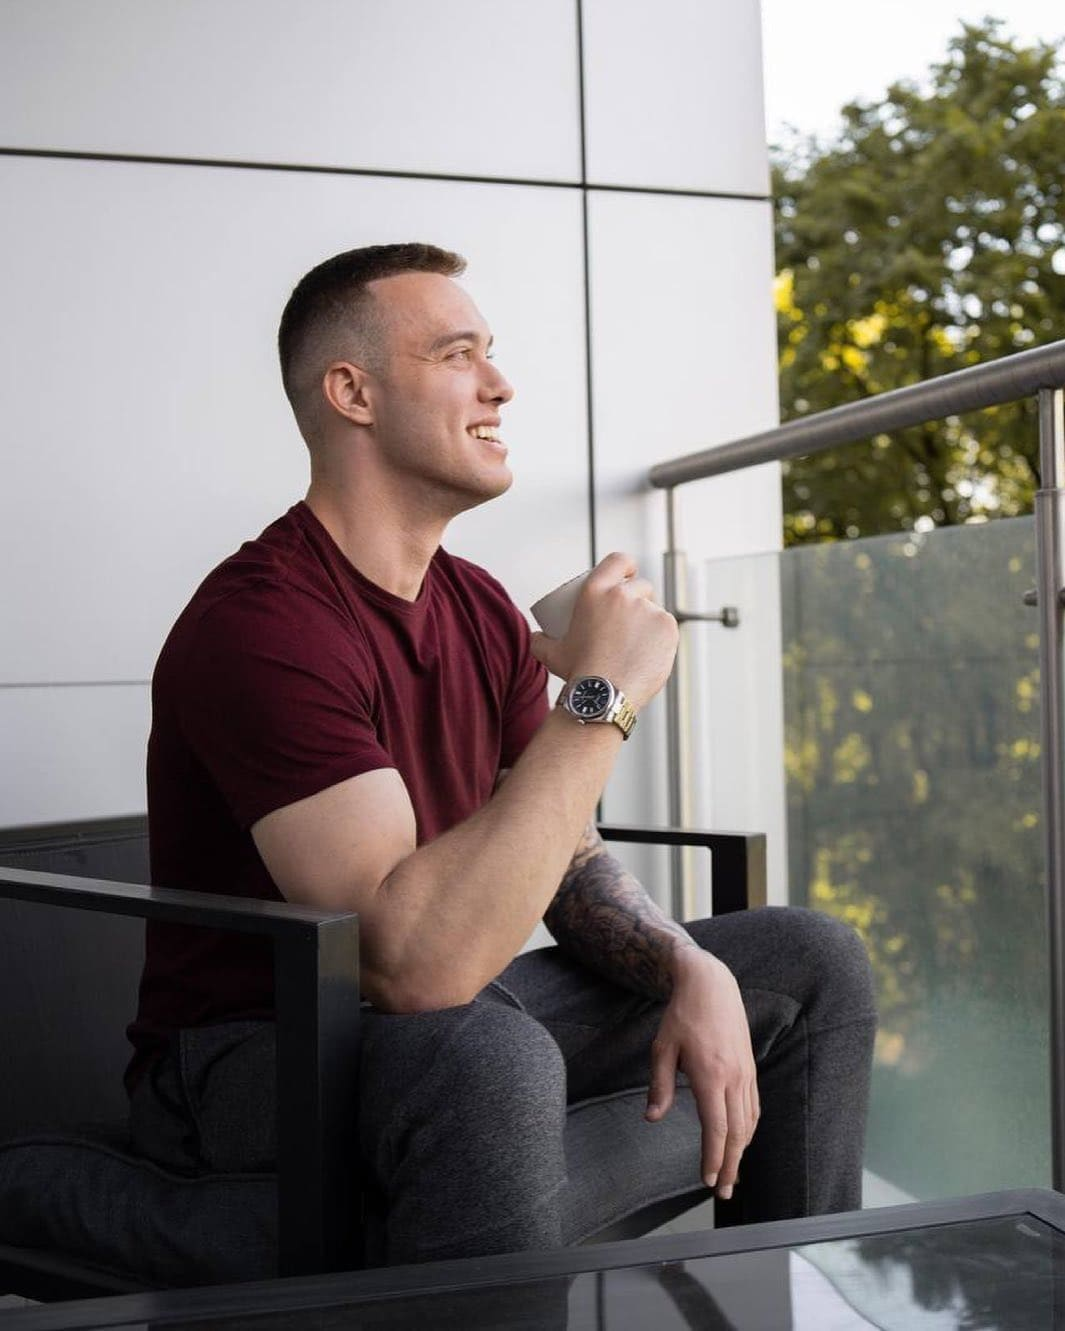 Zack Harrison (Entrepreneur) Wiki, Age, Bio, Net Worth & More 3